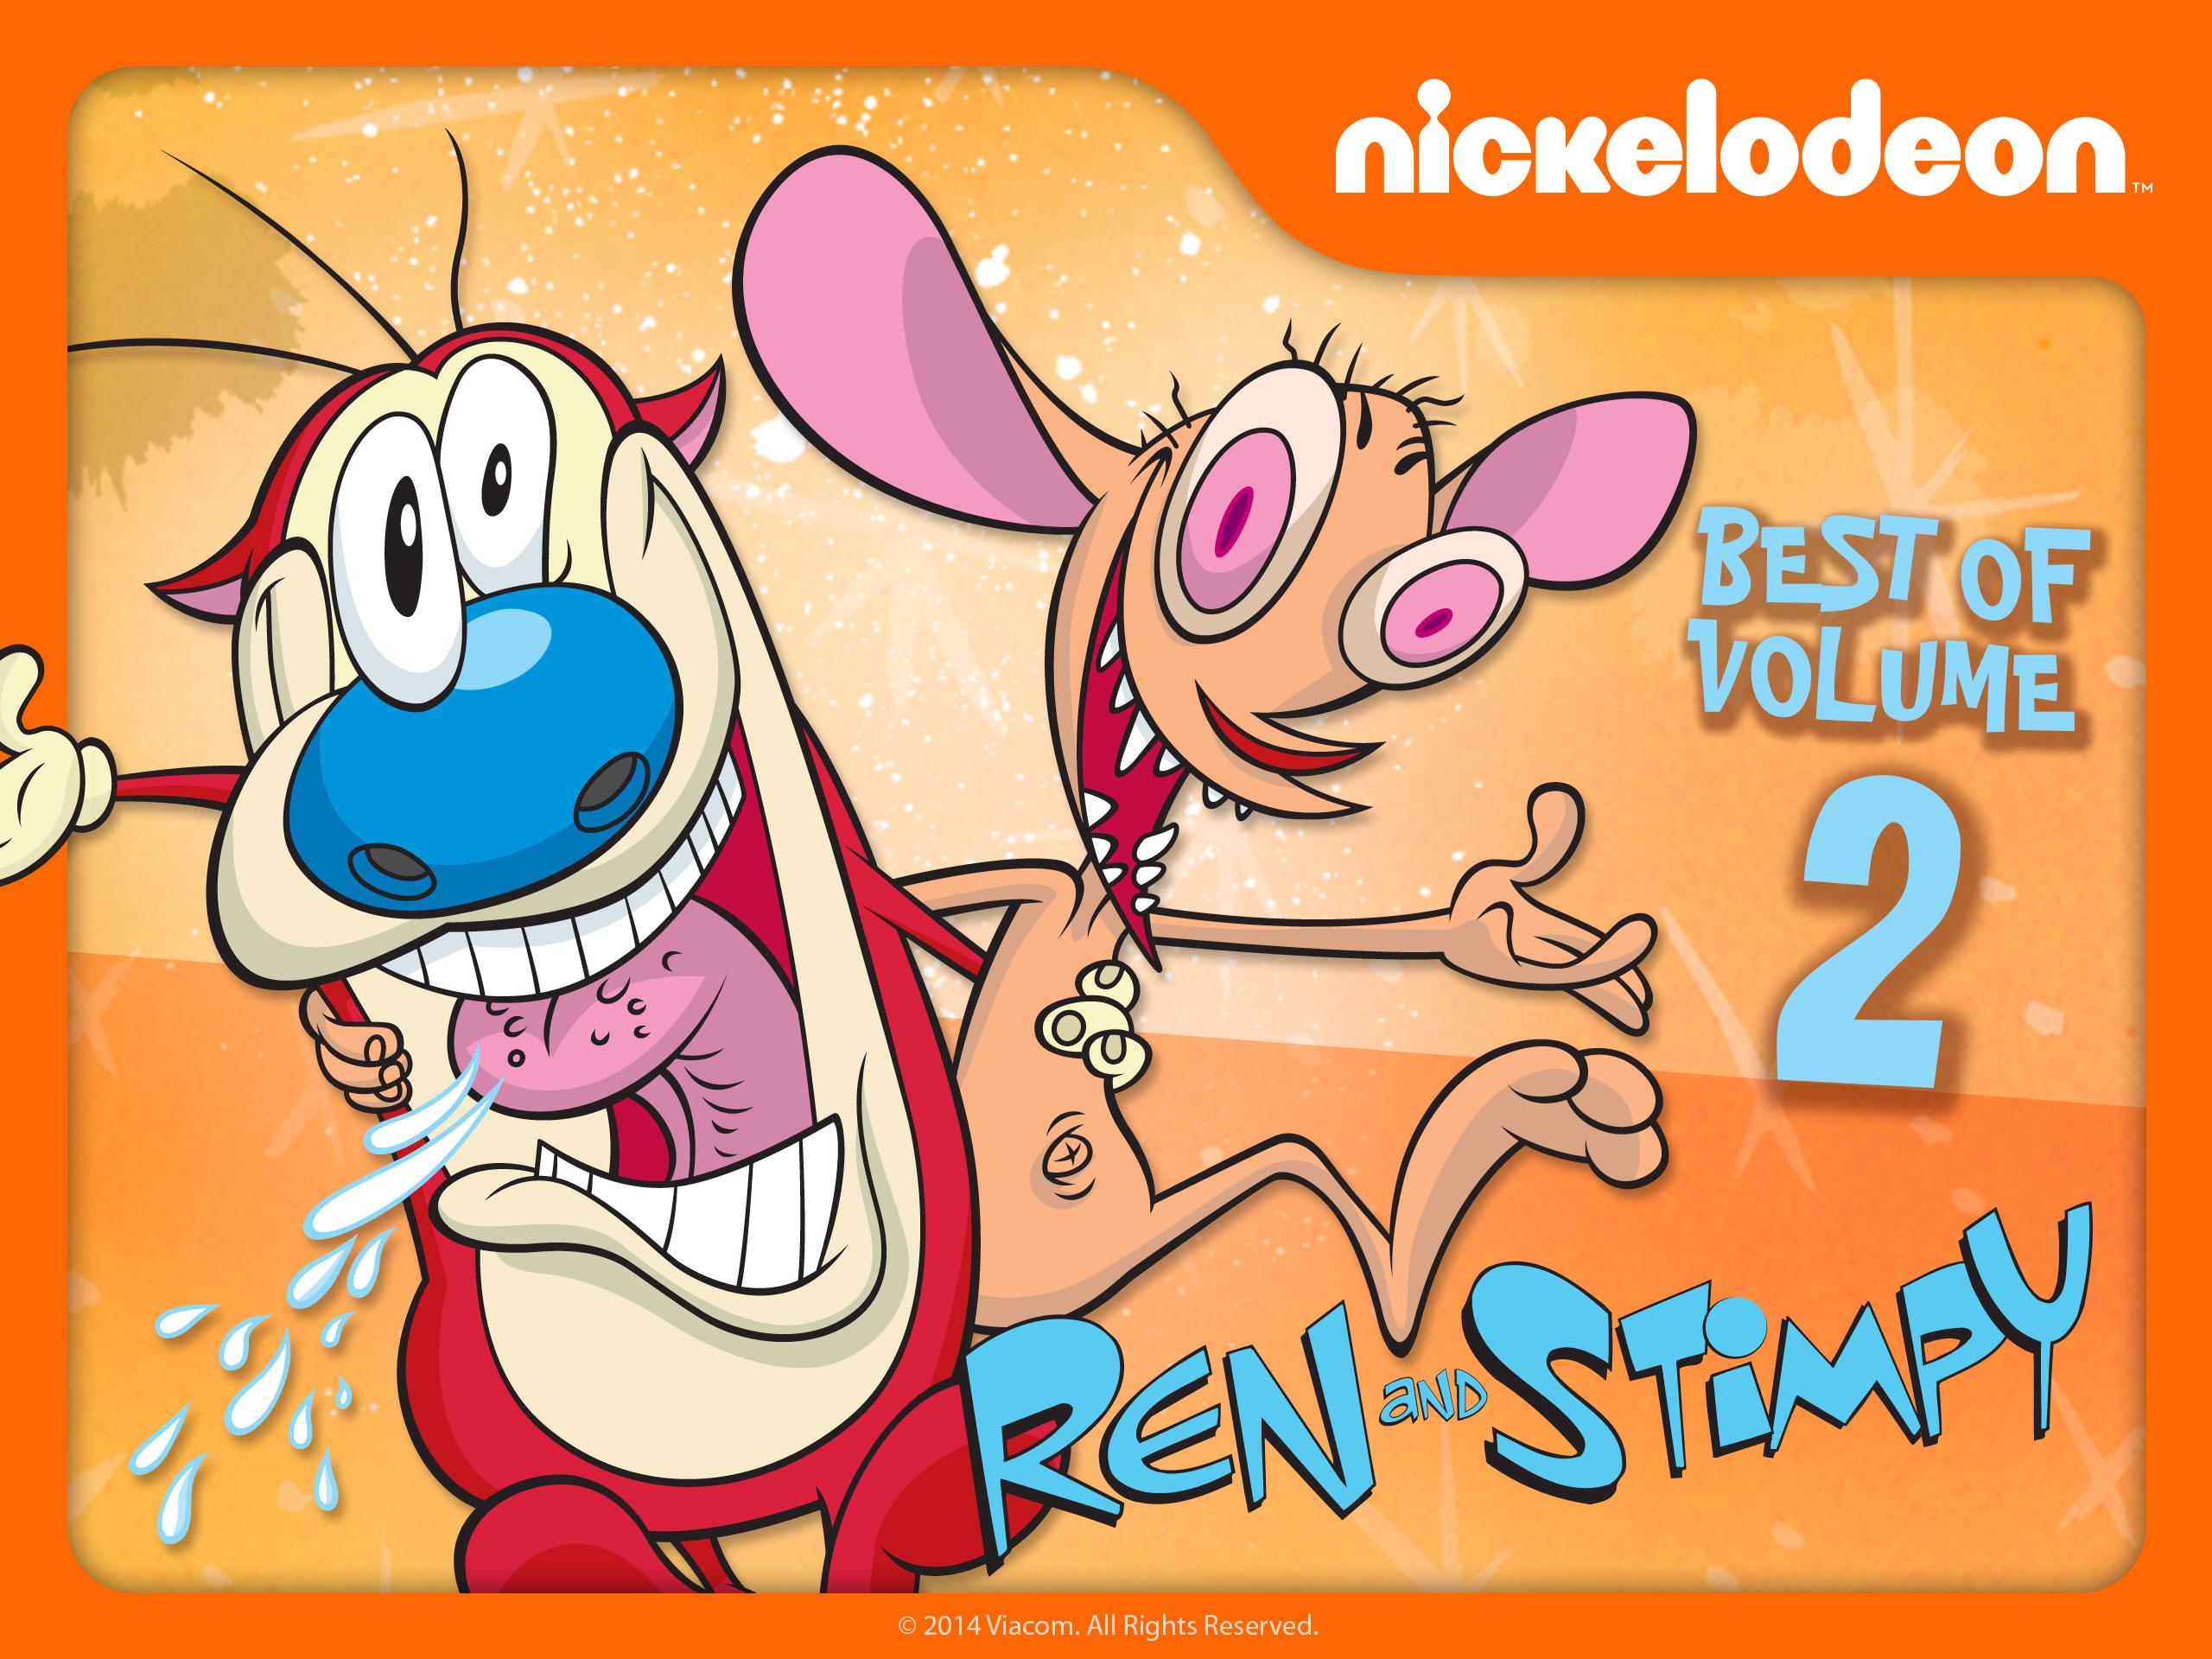 watch the ren stimpy show episodes on nickelodeon season 2 1993